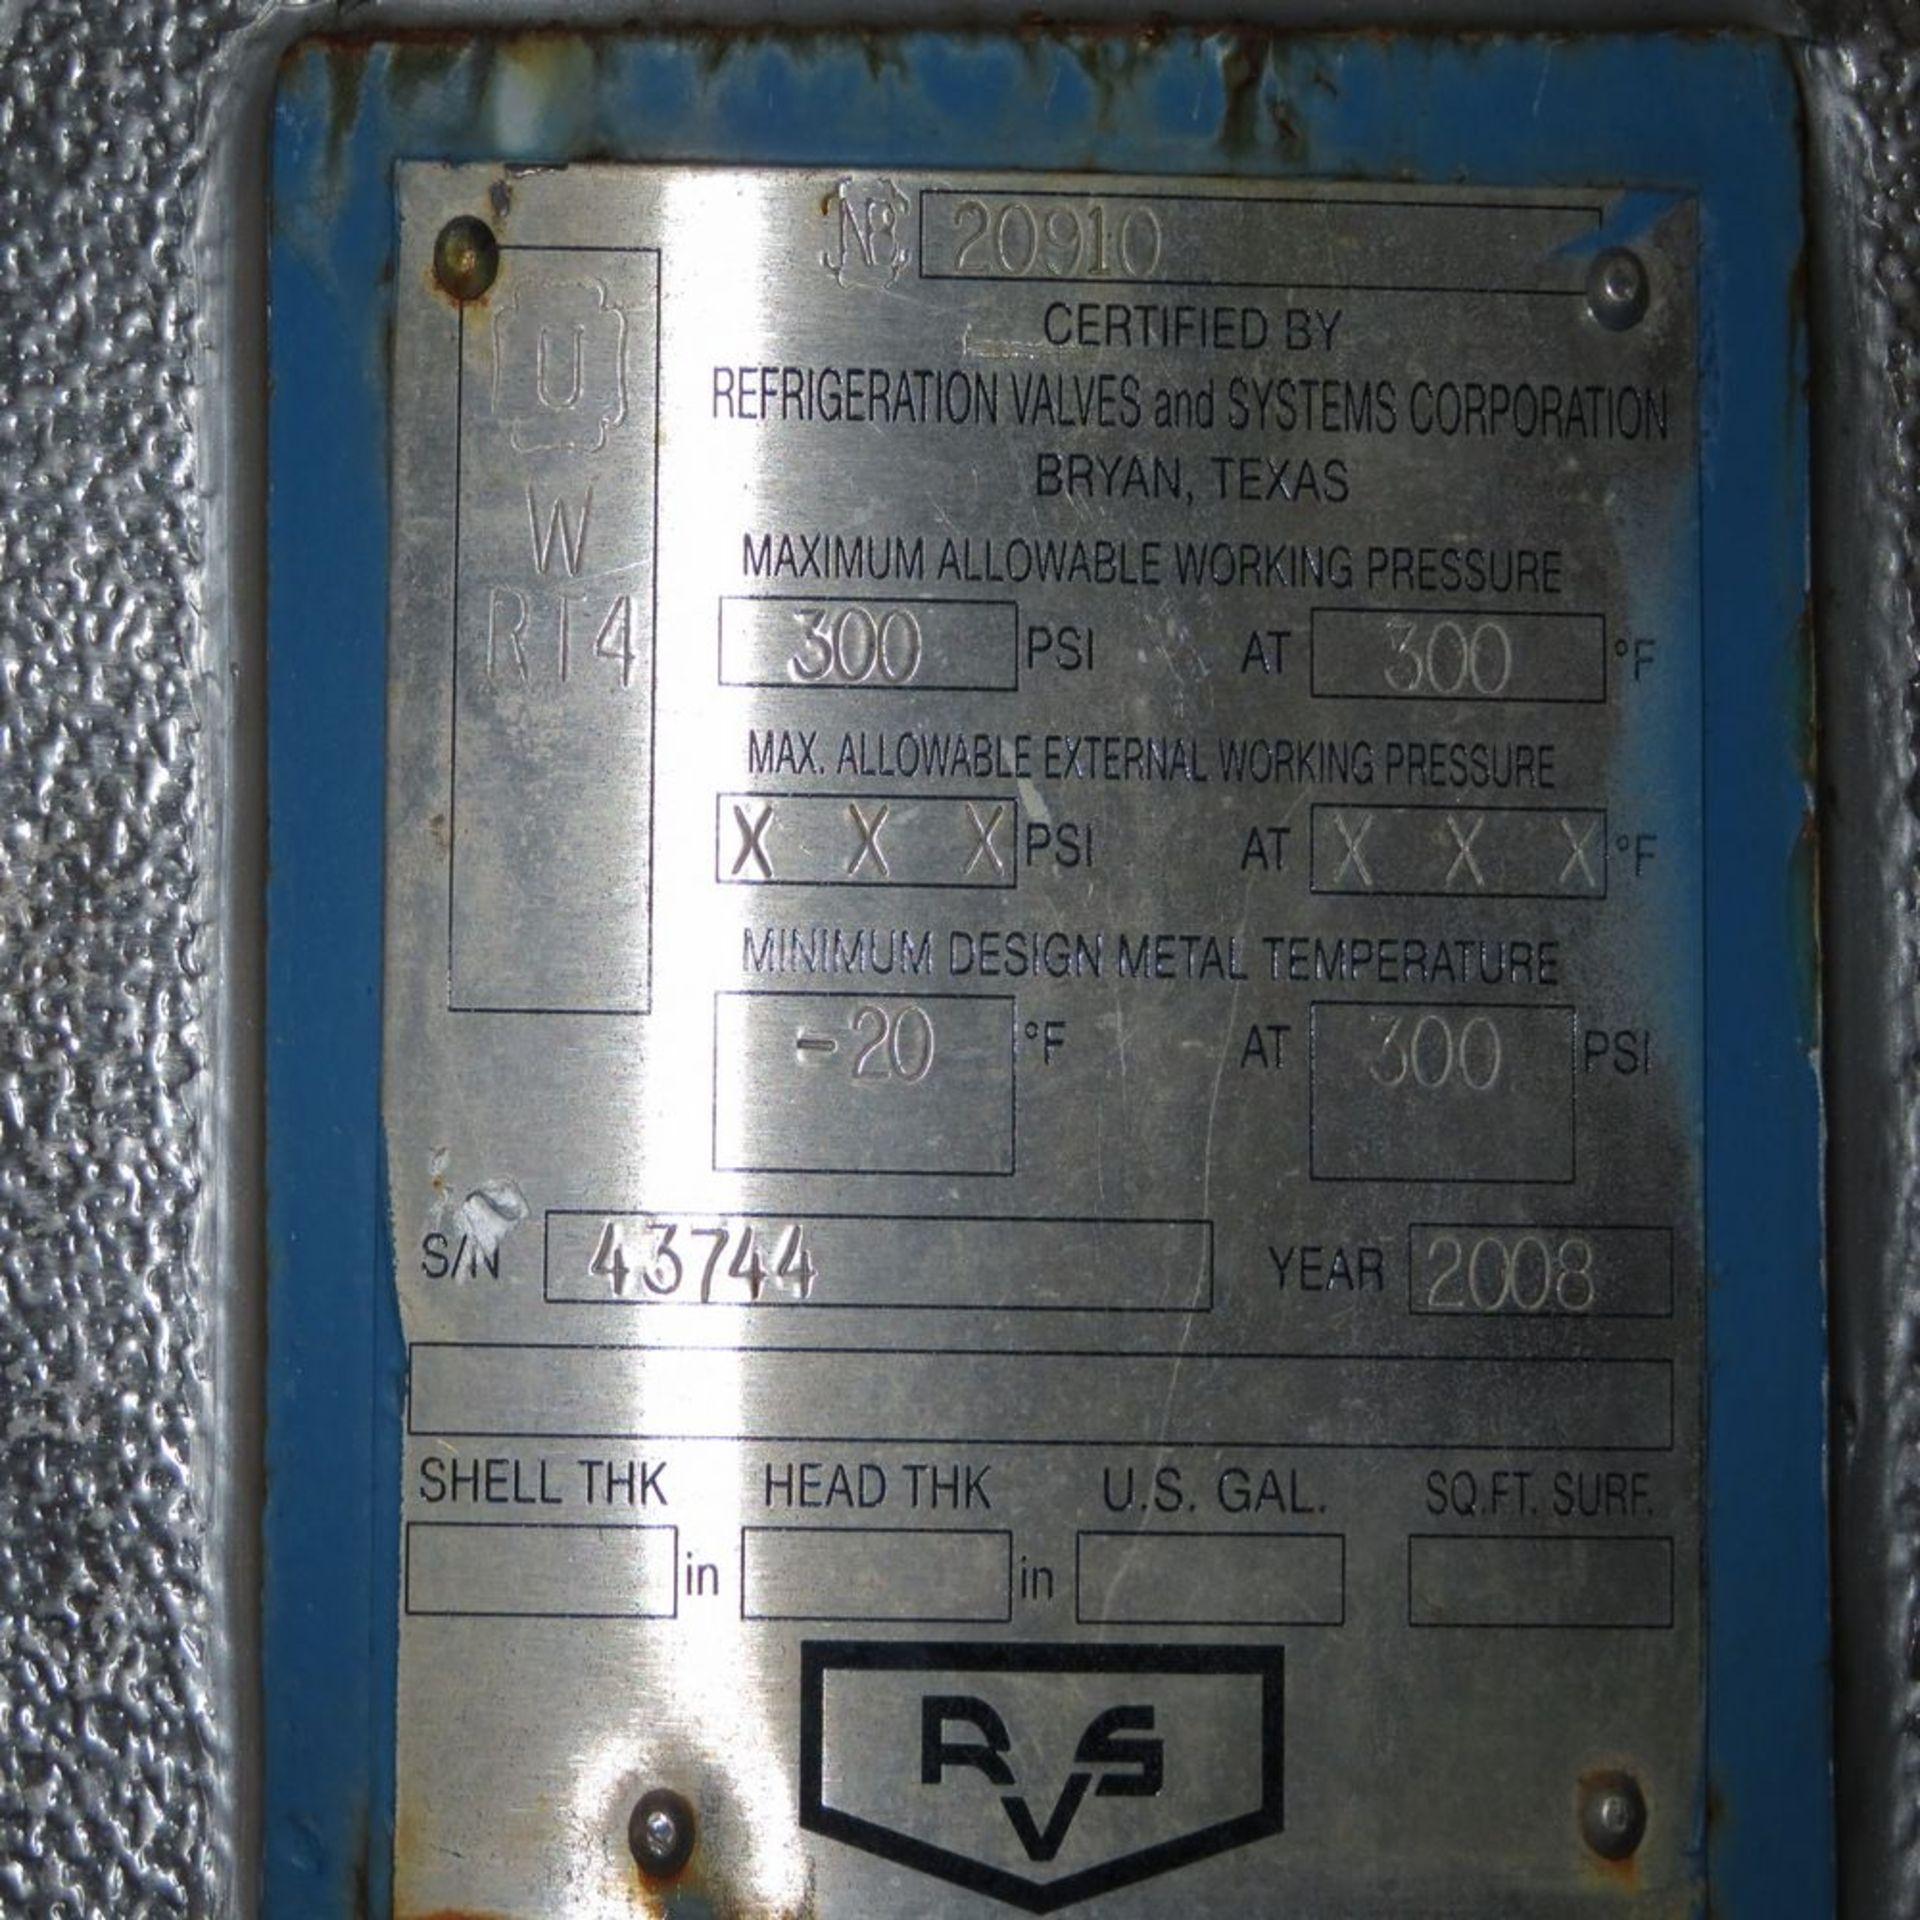 (2008) RVS Ammonia Surge Drum, SD 3-1 w/ - Image 4 of 4